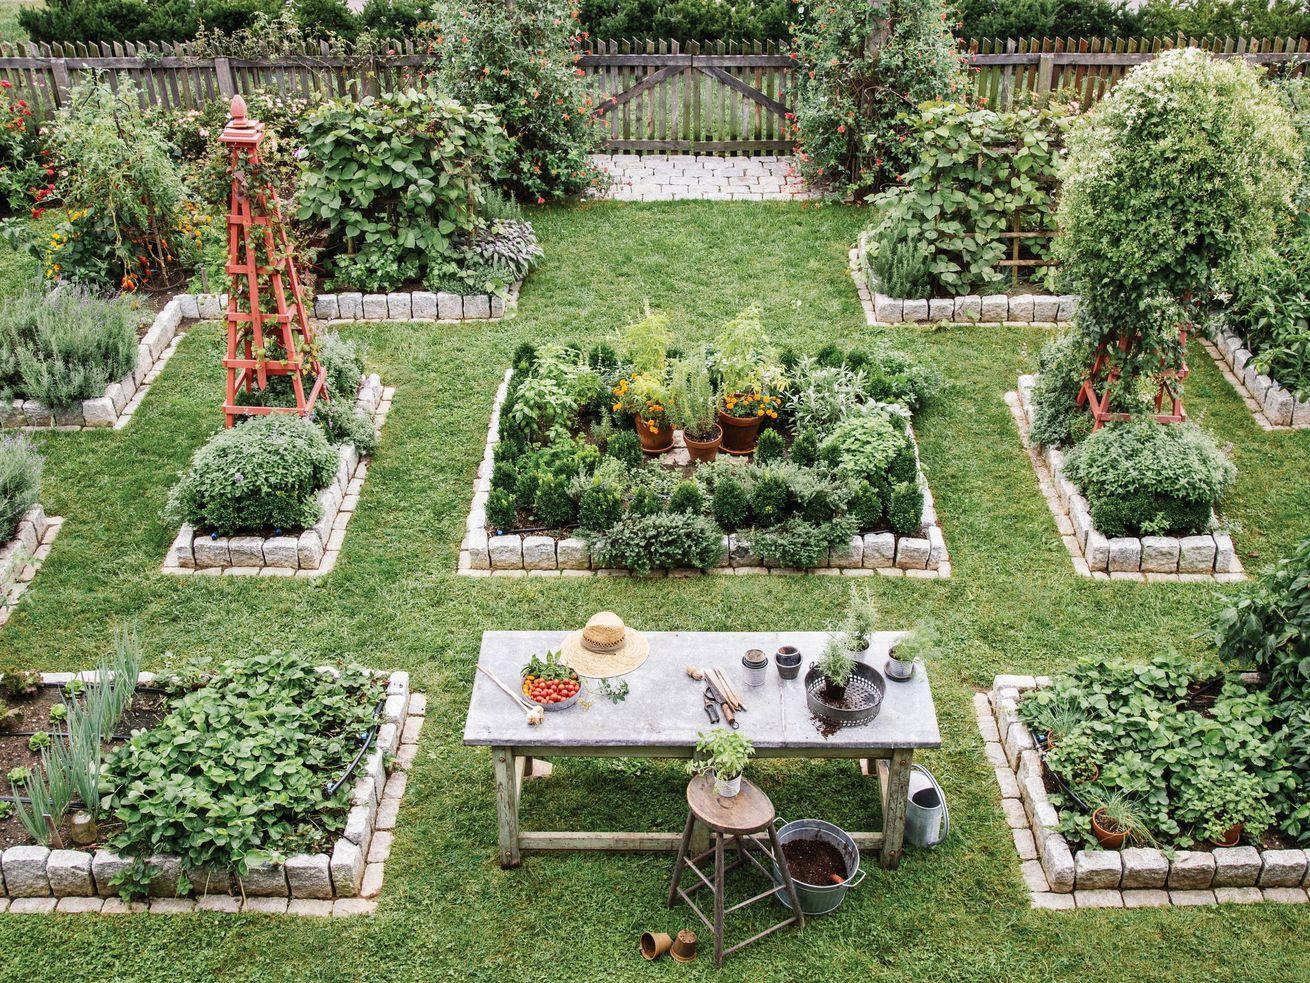 Summer 2021, Landscaping, vegetable and herb garden, bird's eye view